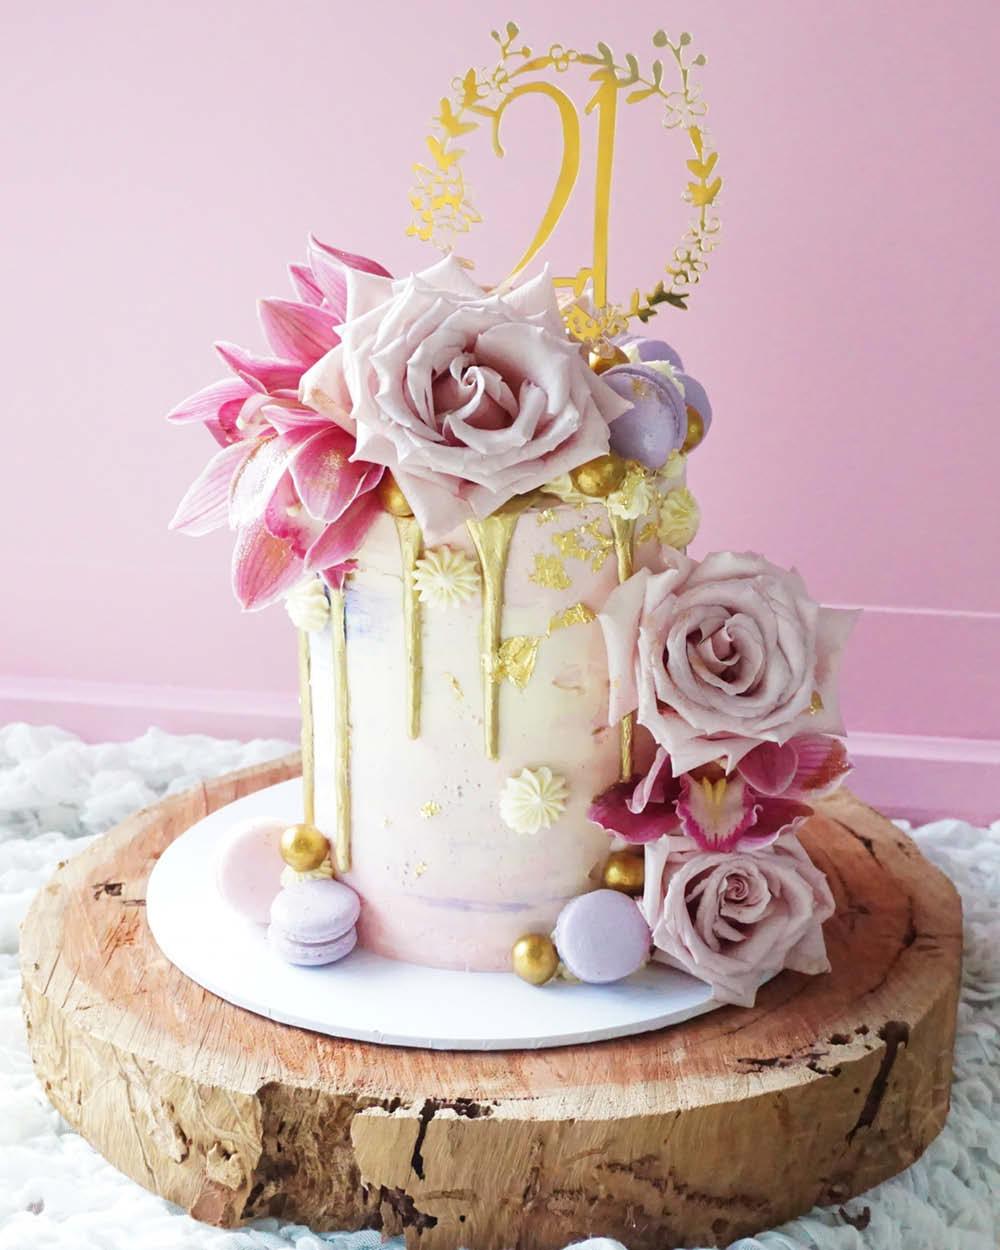 Cakes_By_Aranee_Perth_Drip_Cakes_Custom_Cakes_Wedding_Cakes_Macarons_Cupcakes_Personalised_Cookies_CAKES_Gallery10.jpg